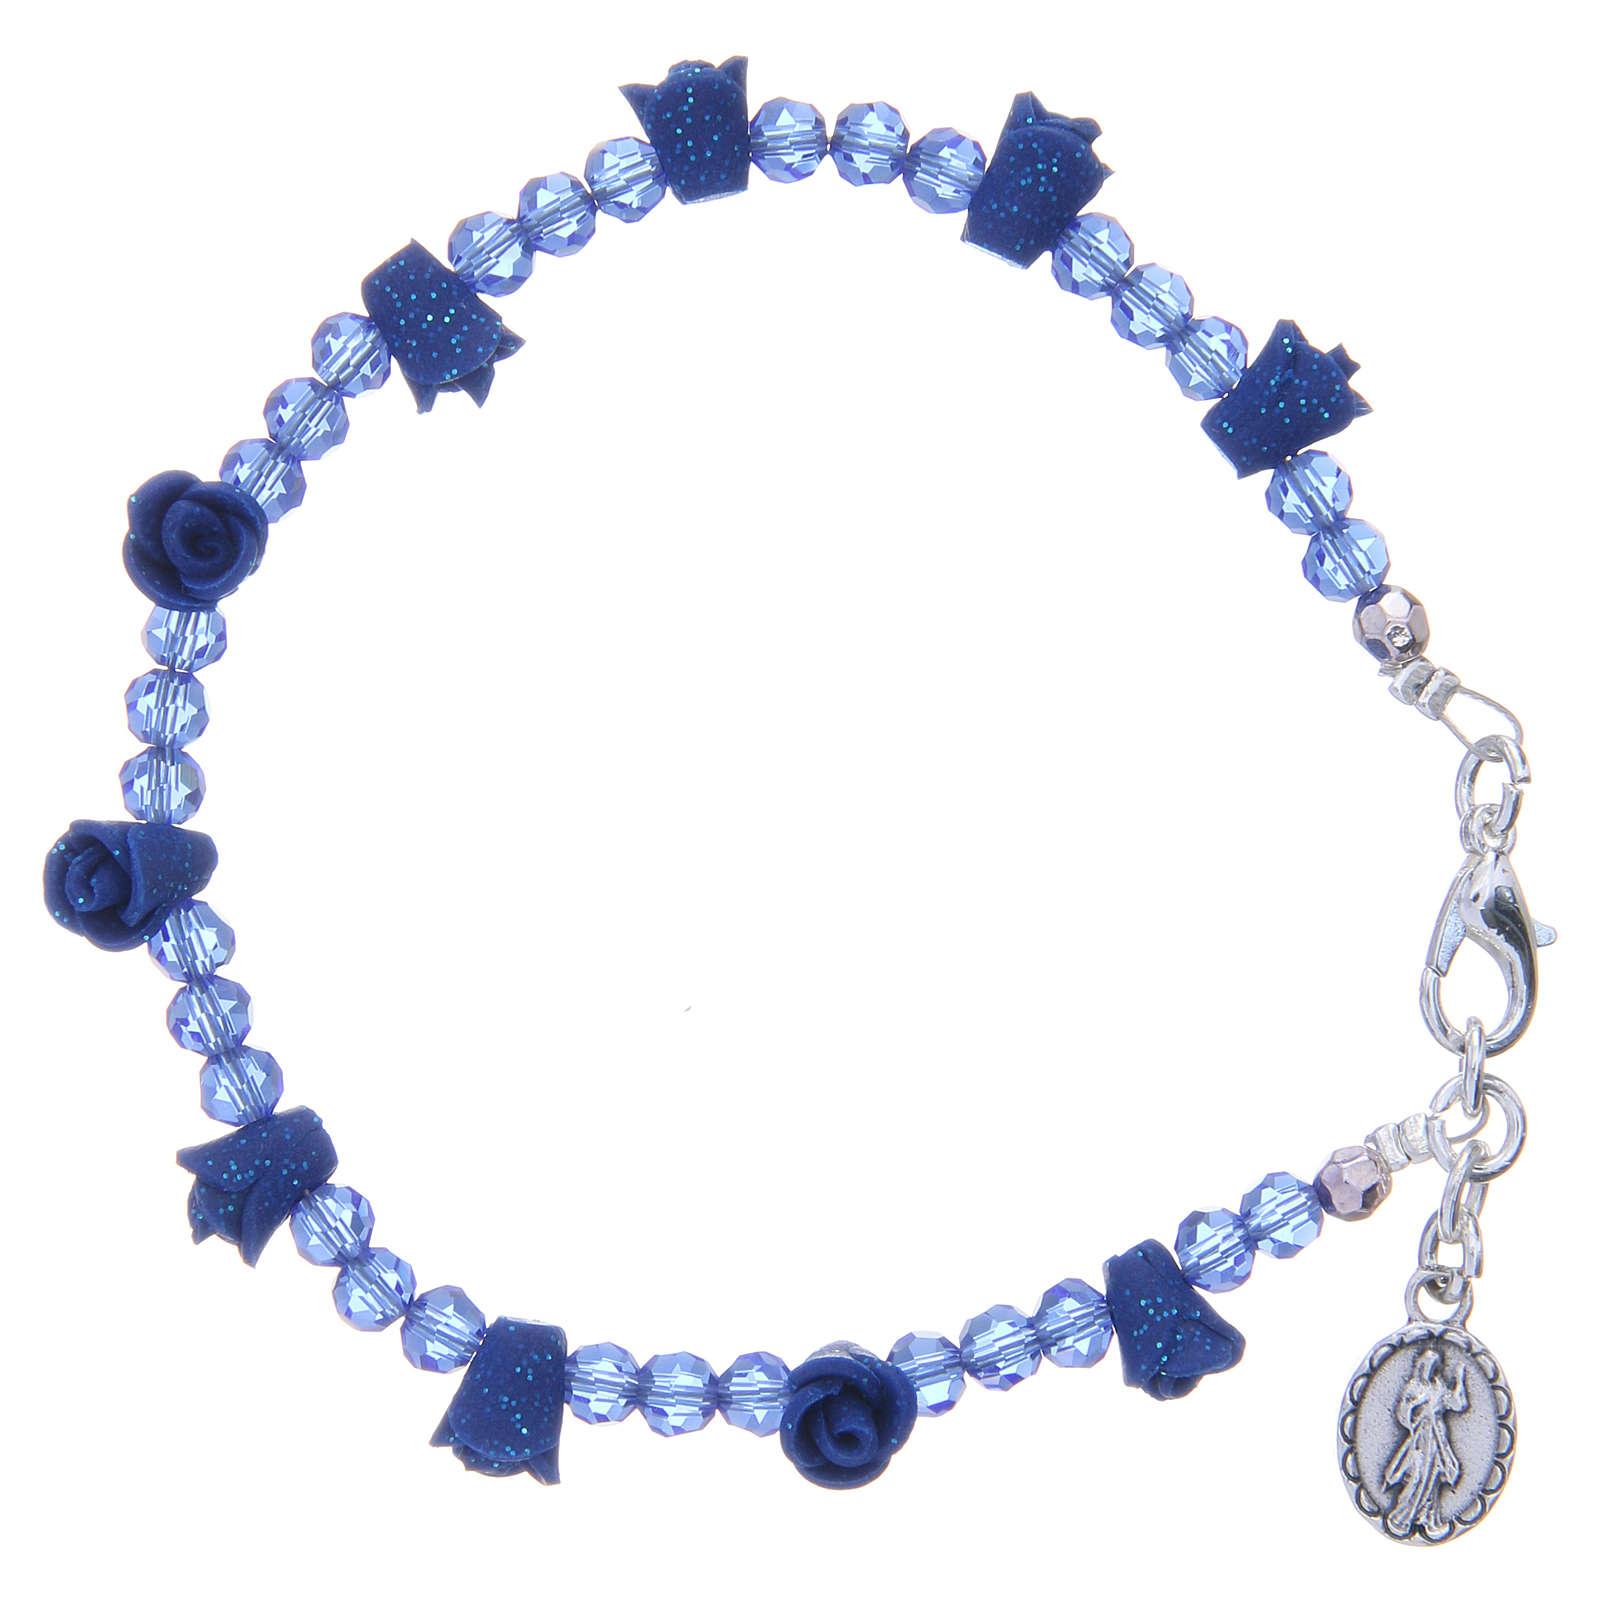 Bracelet chapelet Medjugorje cristaux bleus 4